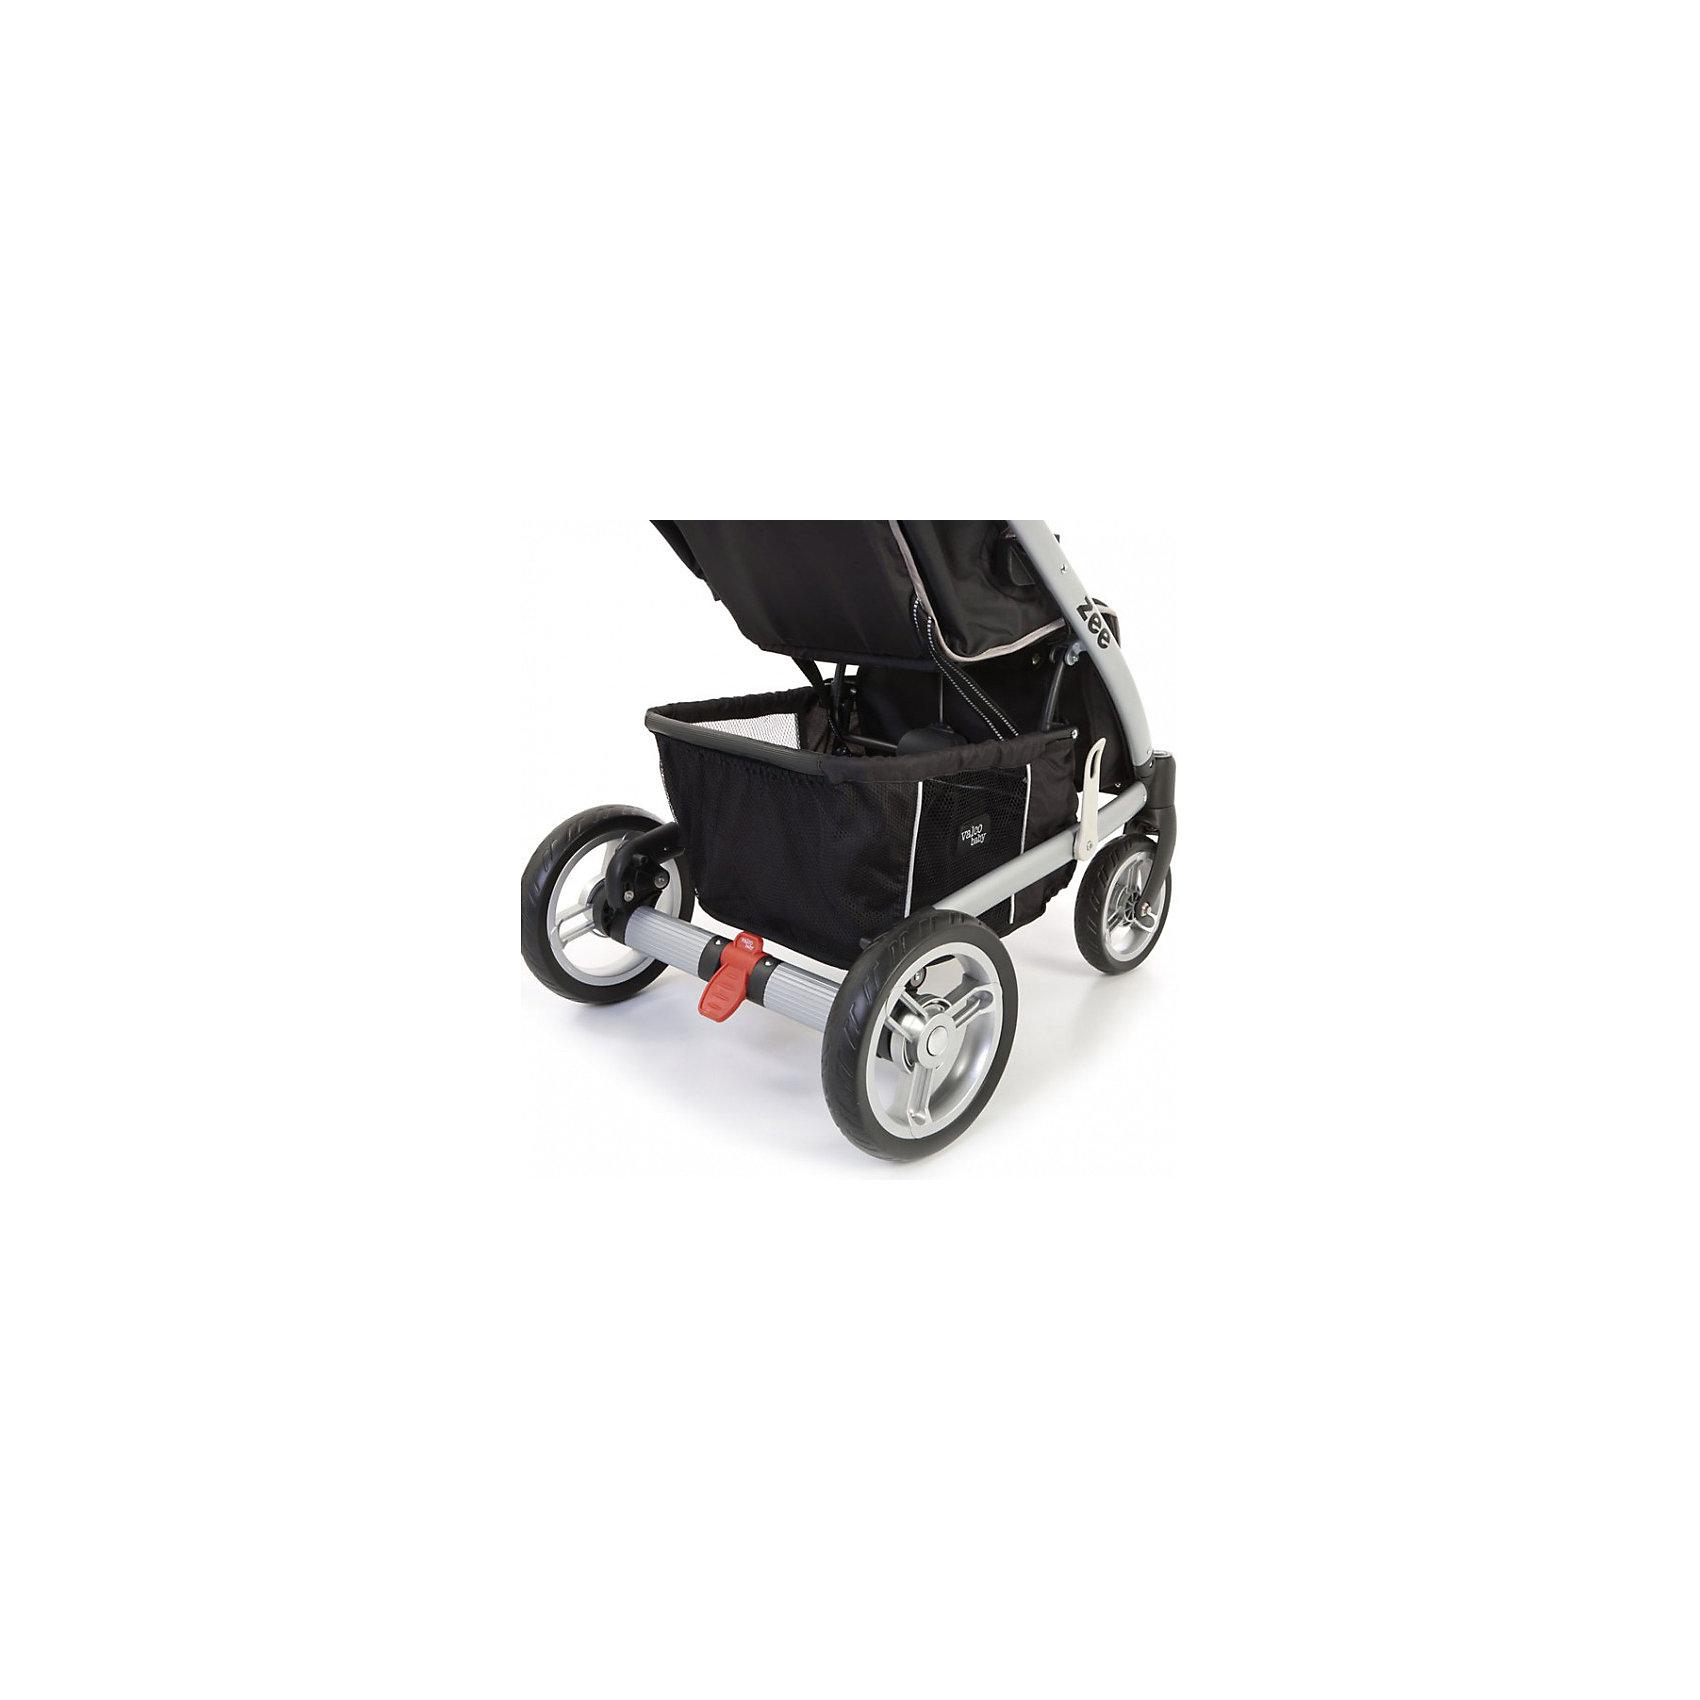 Прогулочная коляска Valco baby Zee, blue opal